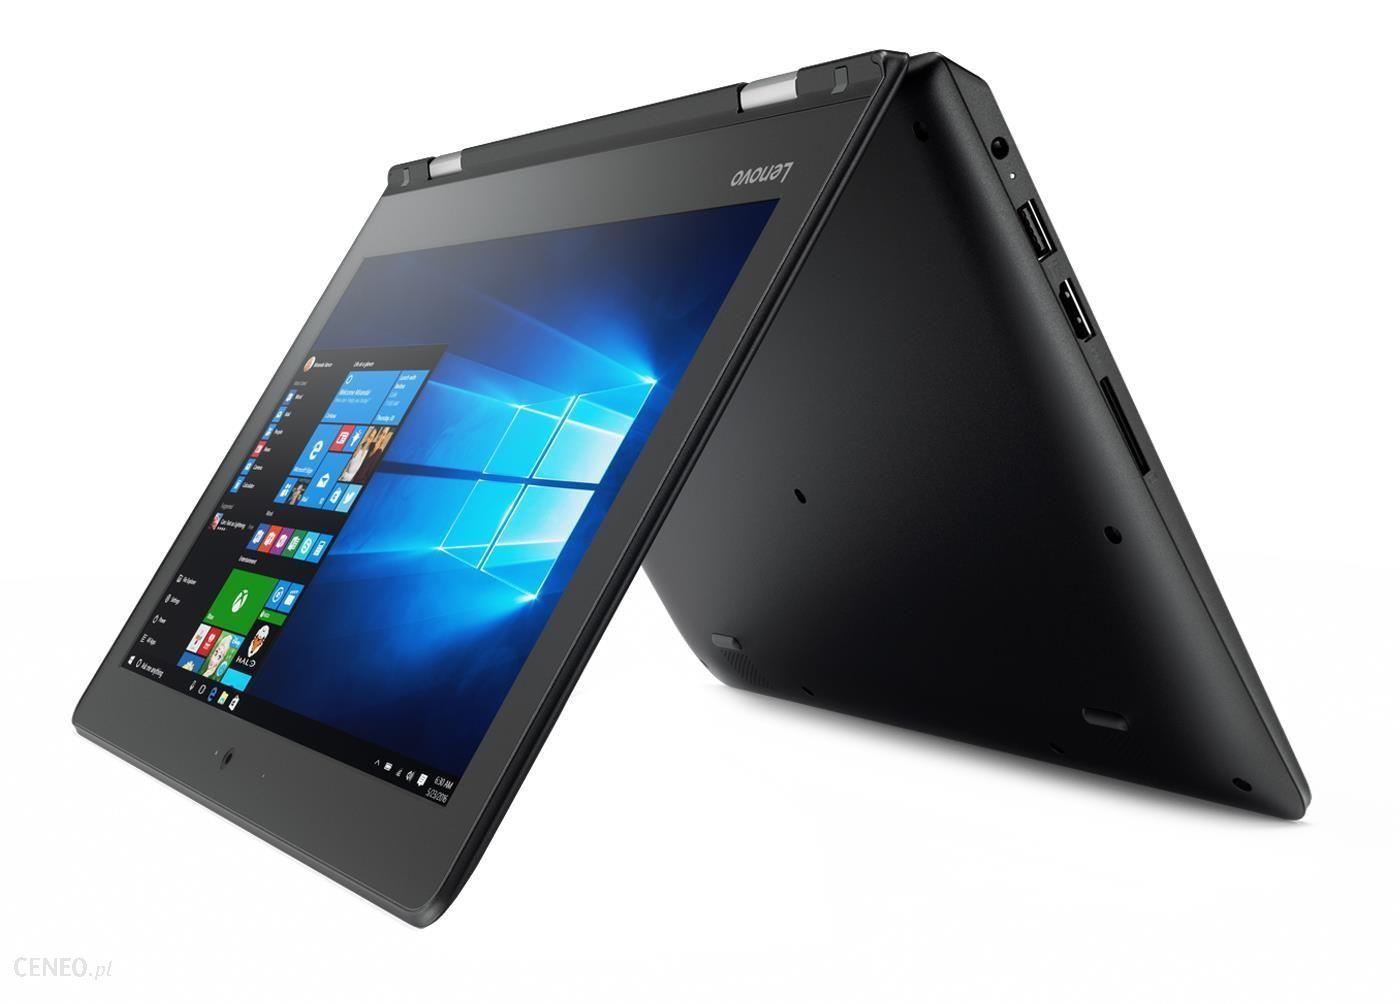 Laptop Lenovo YOGA 310-11iap (80u2005FPB) Carrefour